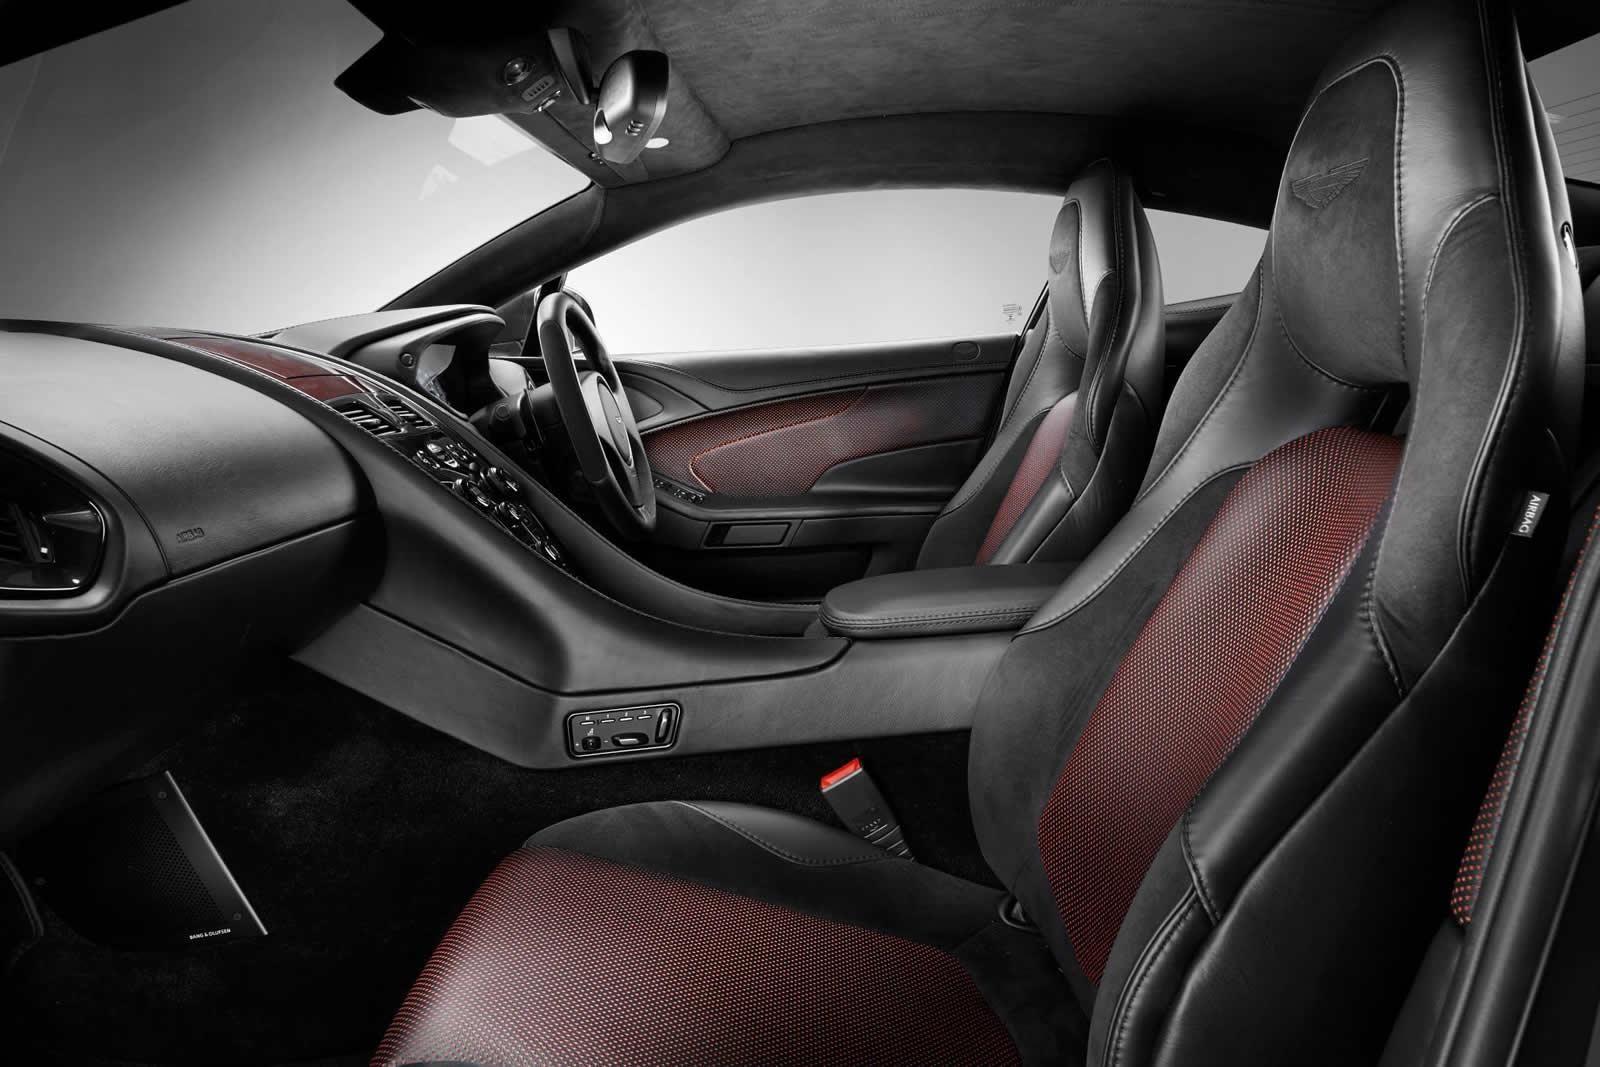 2015 Q by Aston Martin Vanquish Coupe in Satin Jet Black